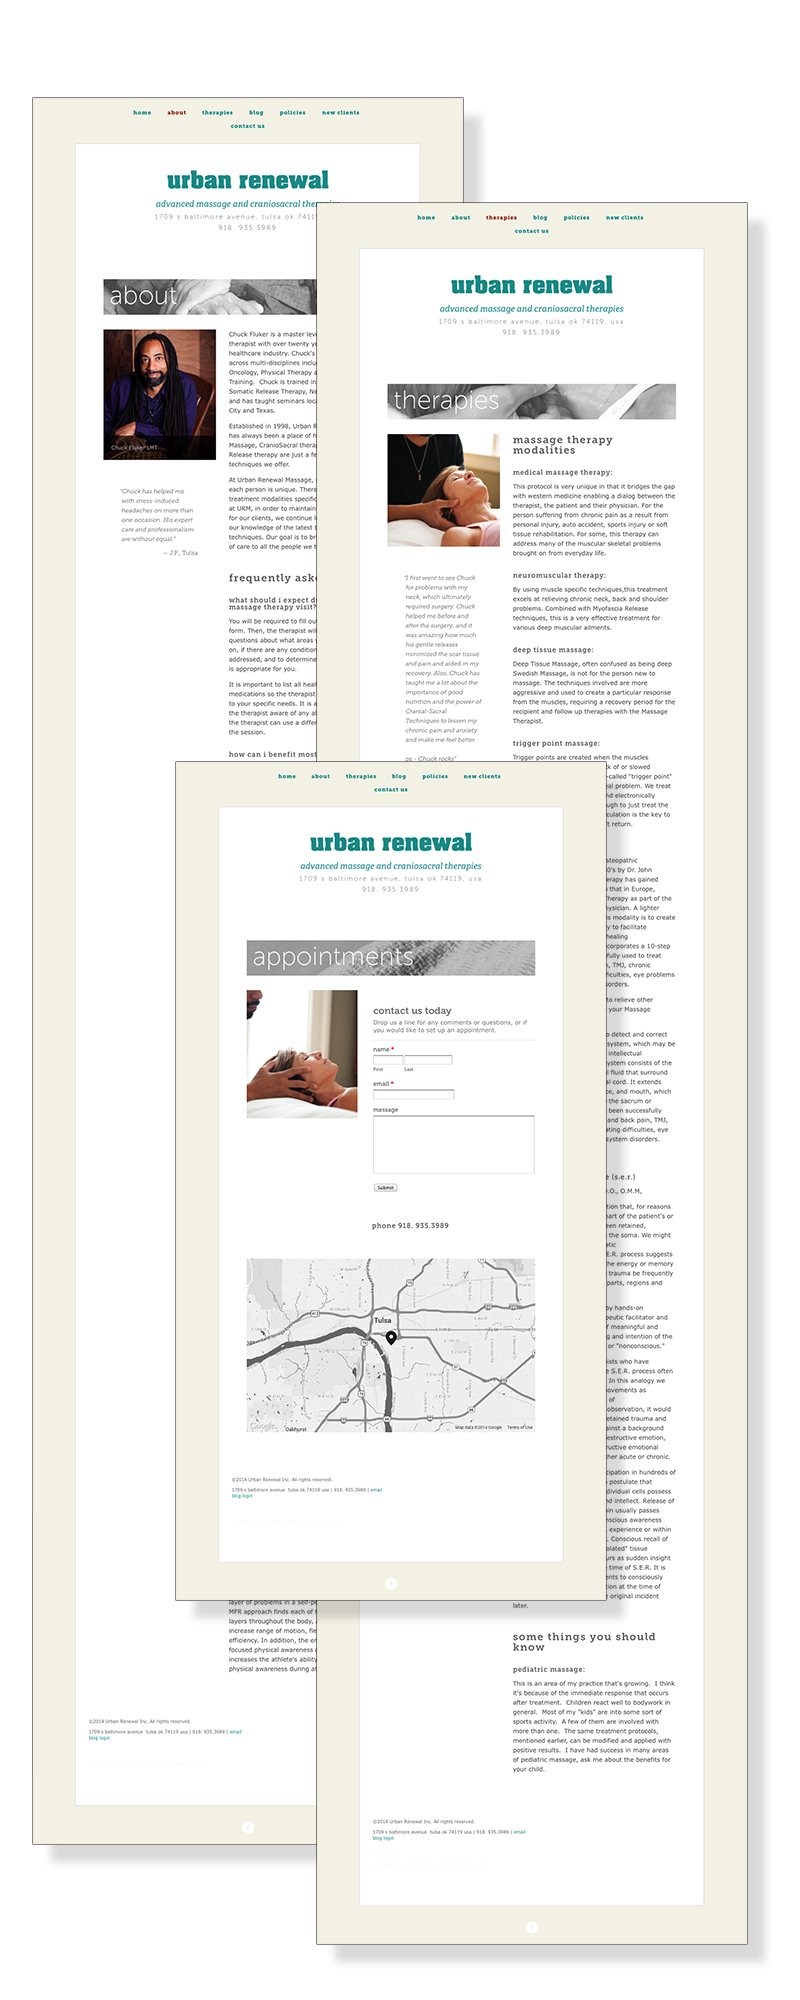 urban-renewal-pages-tmoss-portfolio.jpg